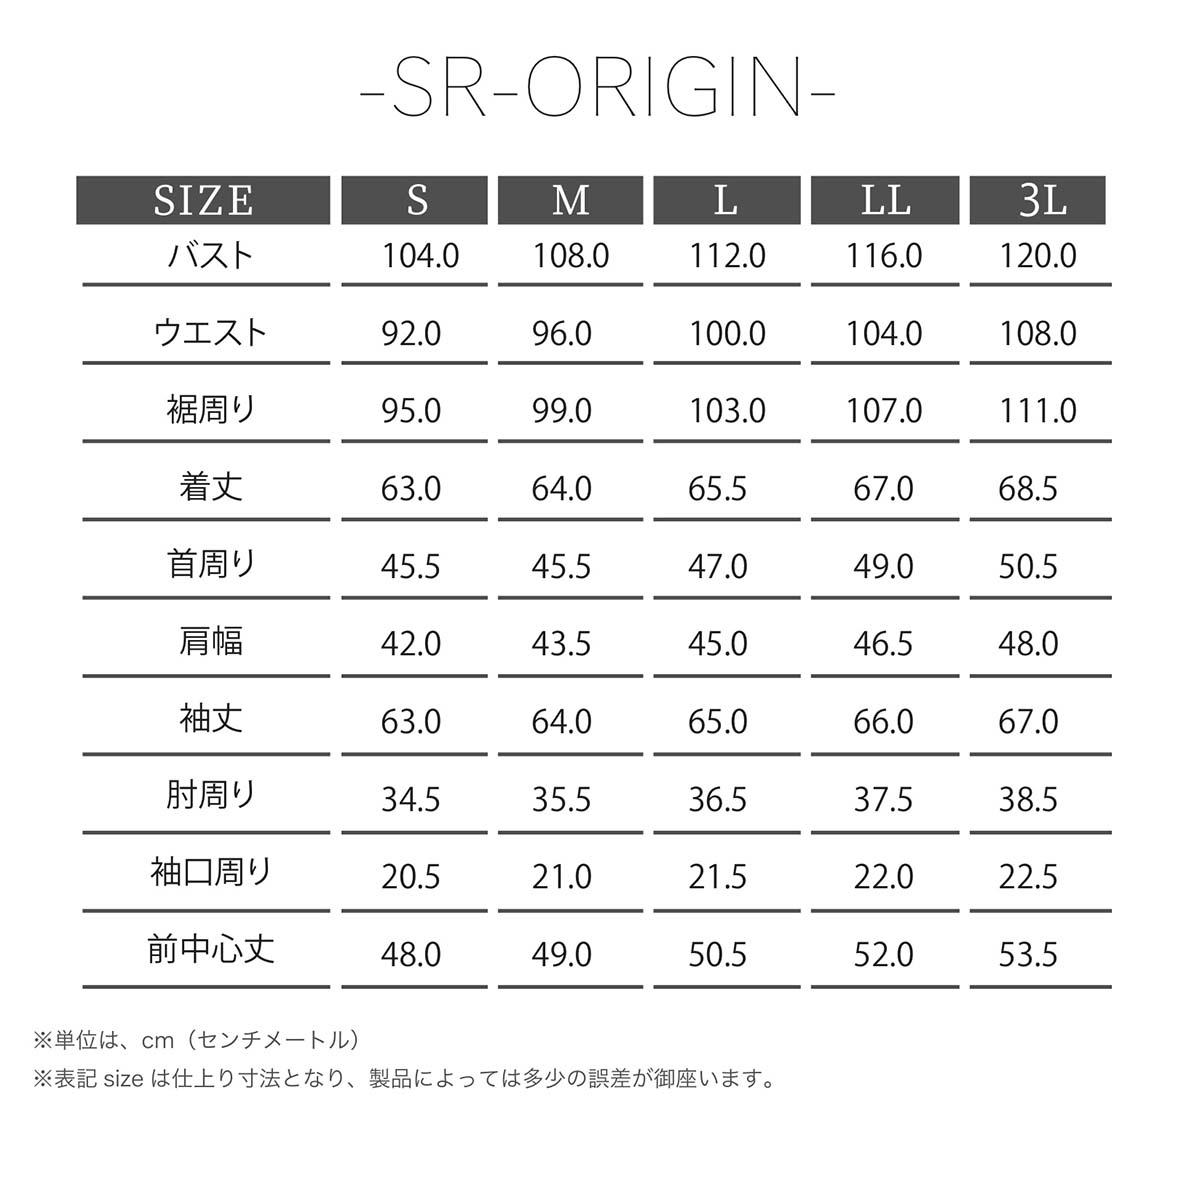 KADOYA(カドヤ) K'S LEATHER SR-ORIGIN シングルライダース ネイビー